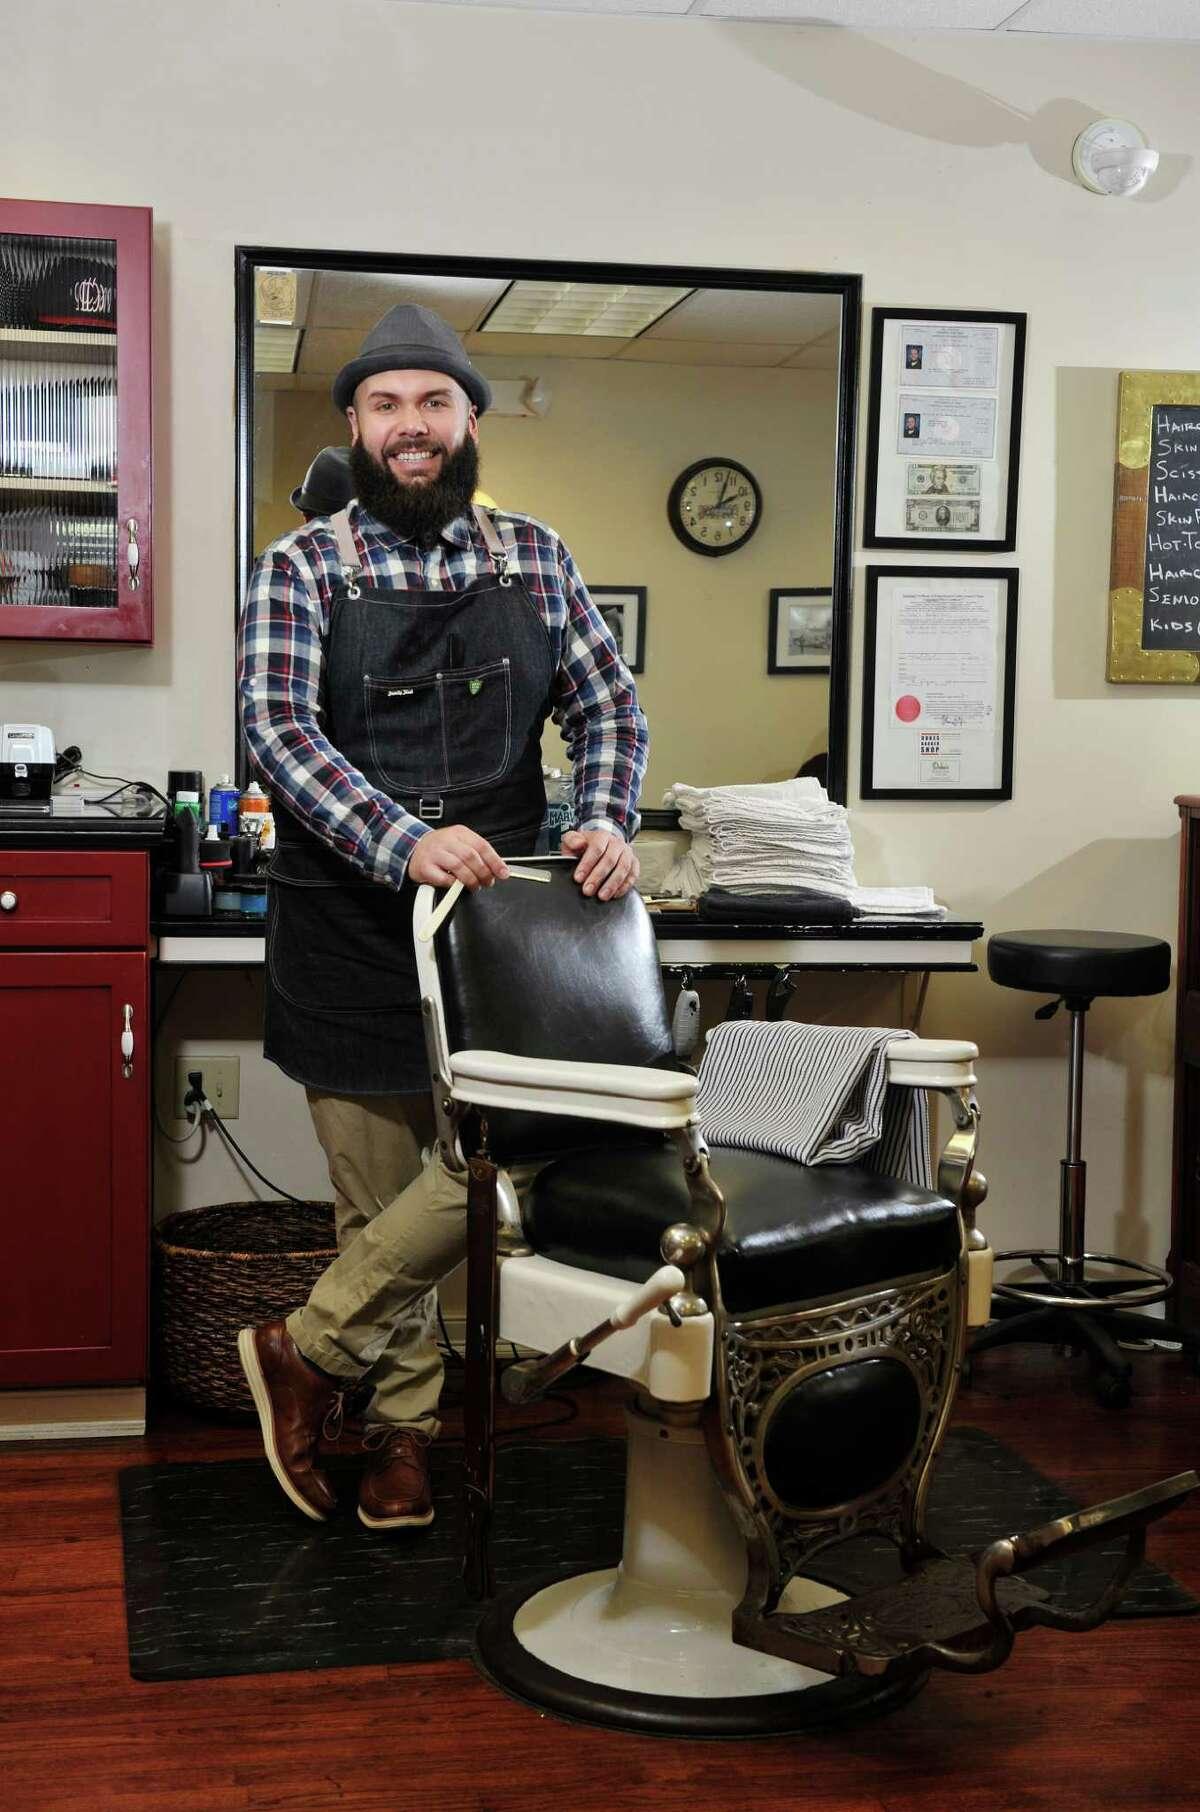 Duke (Mike Duker), owner of Duke's Barbershop in Albany, N.Y. (Paul Buckowski / Times Union)